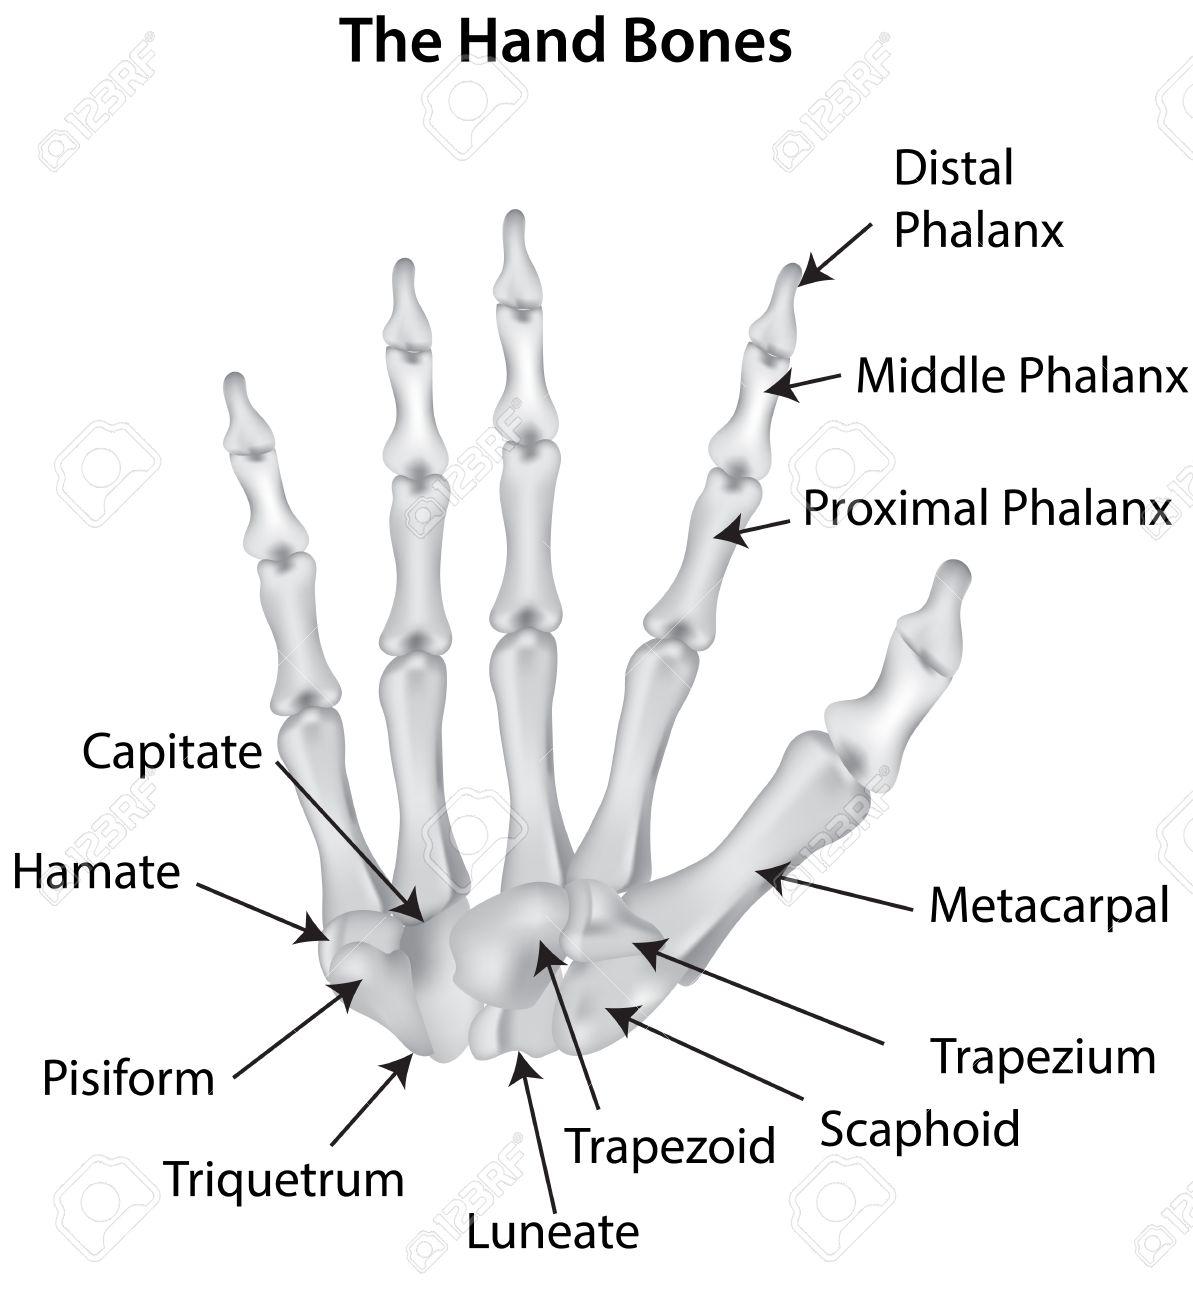 the hand bones labeled diagram royalty free cliparts vectors and  : hand bones diagram - findchart.co